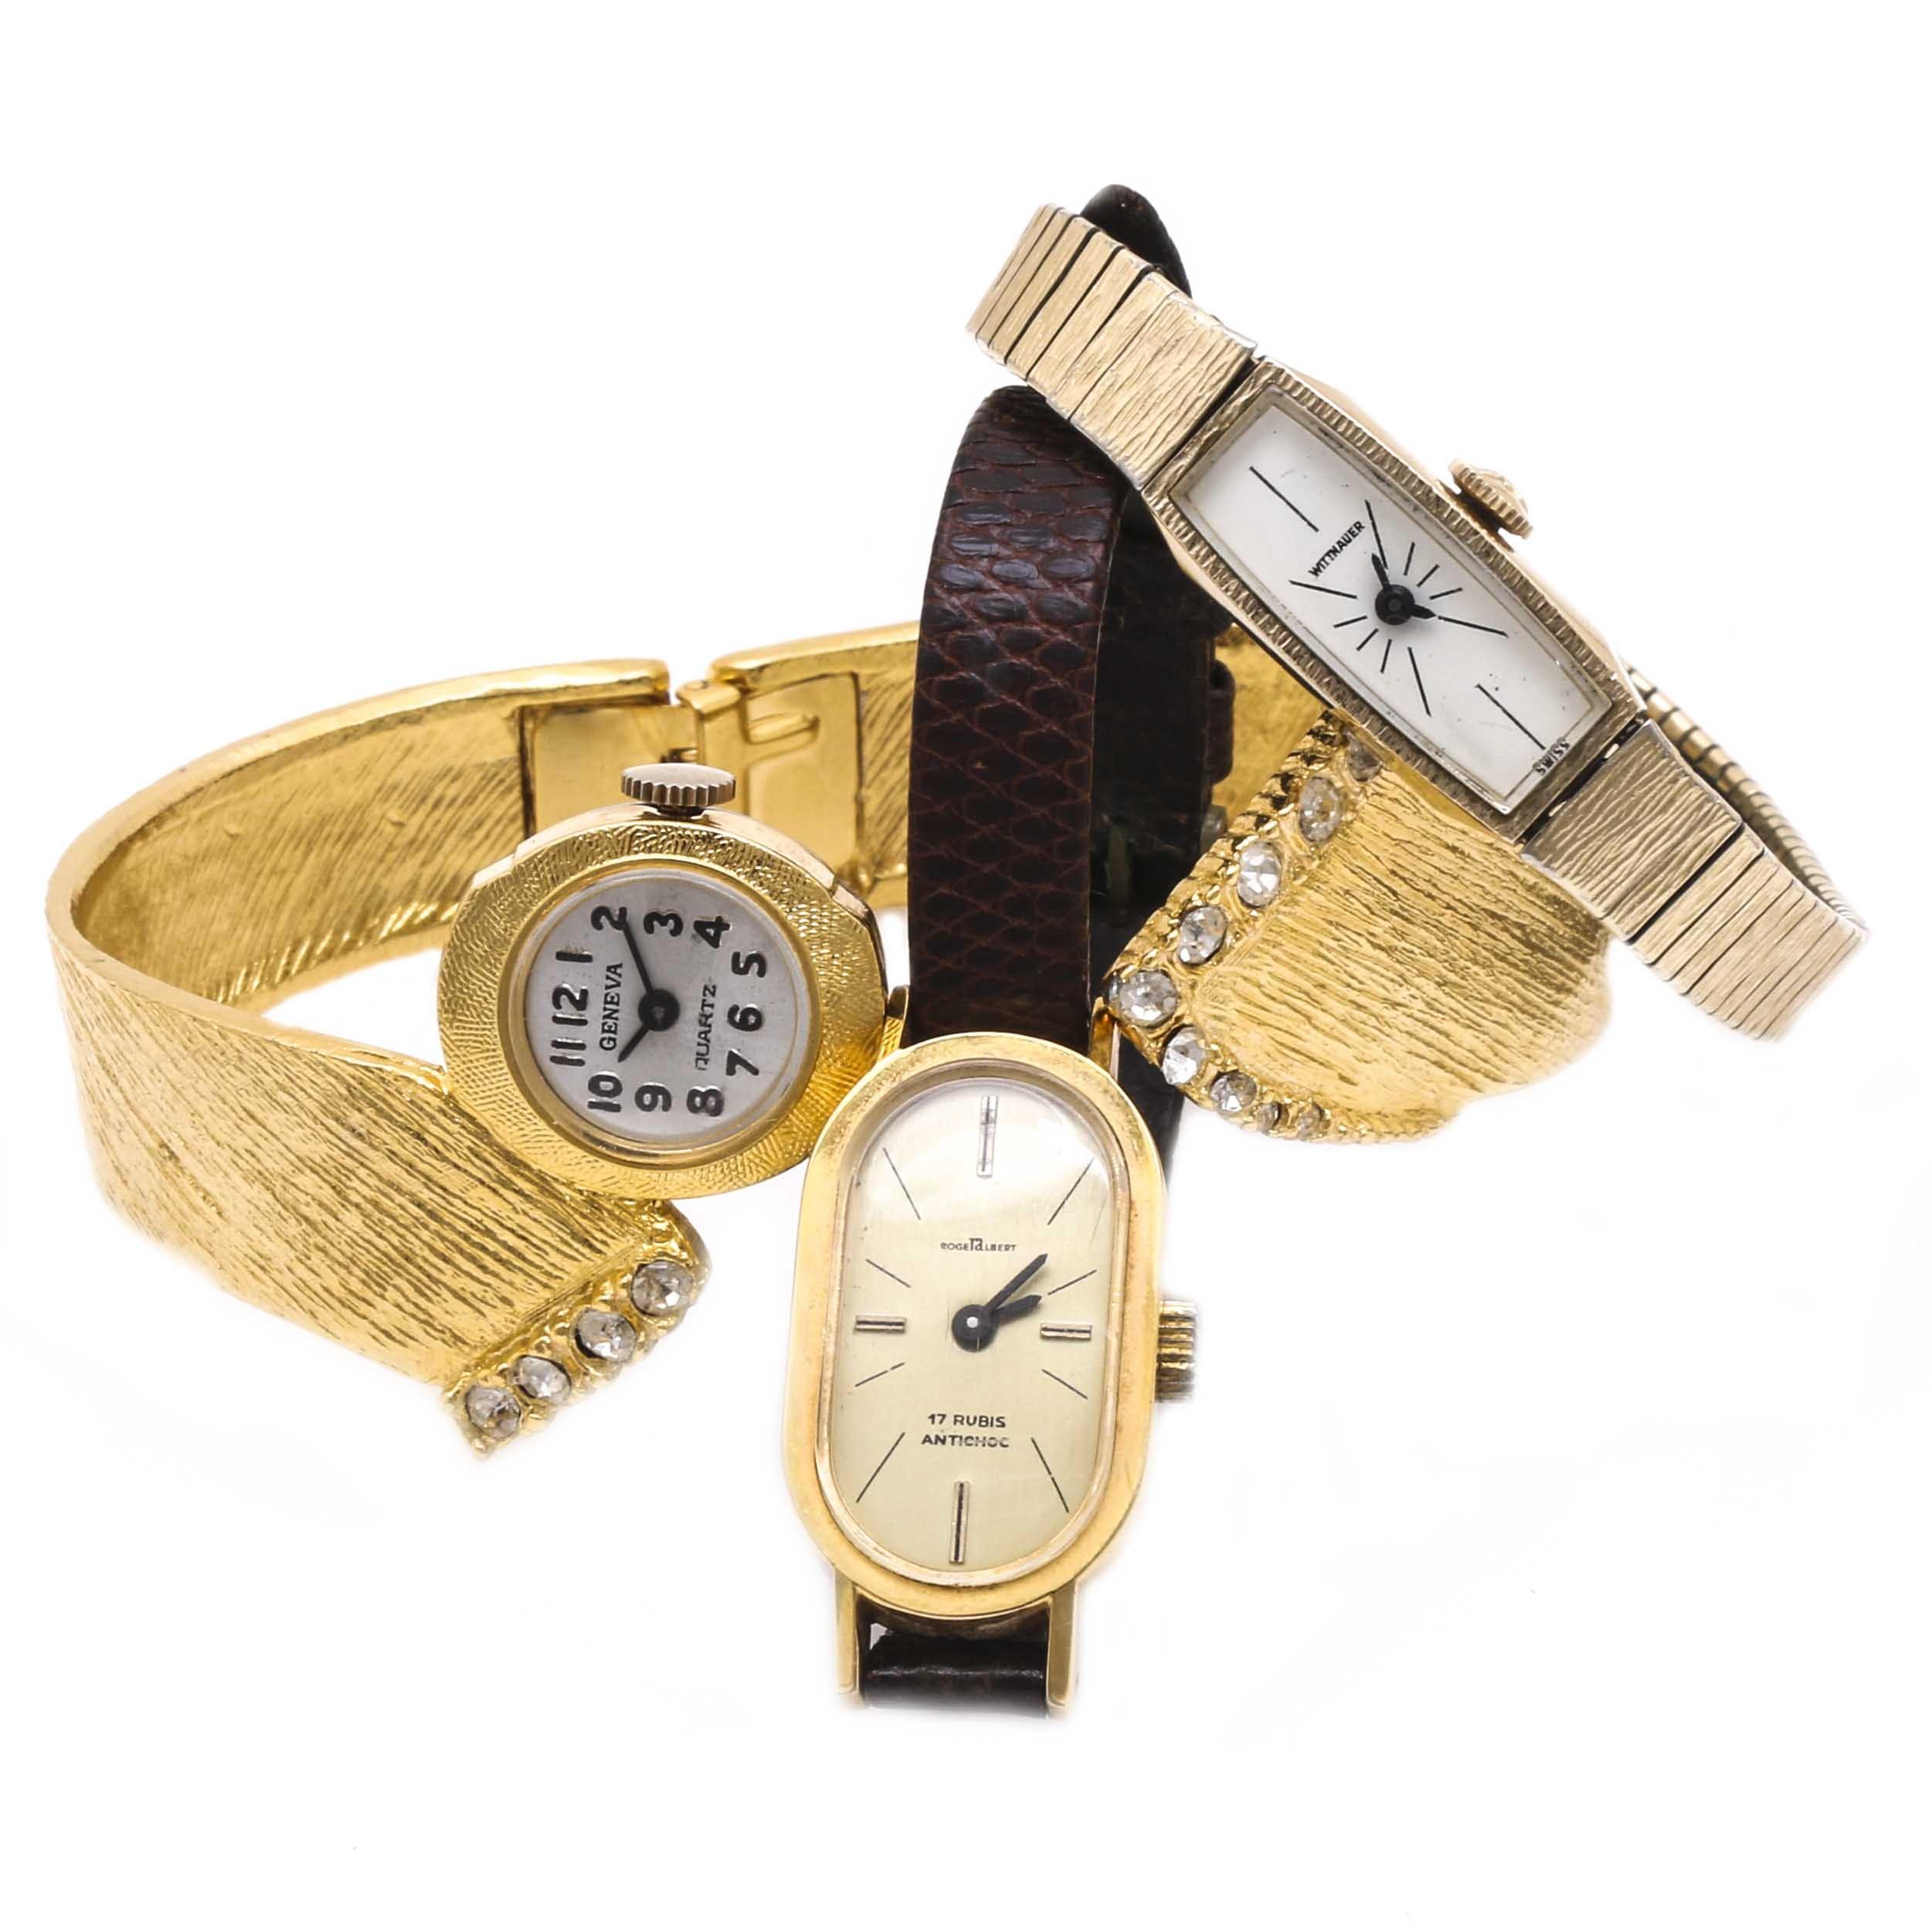 Gold Tone Wristwatch Assortment Including Geneva